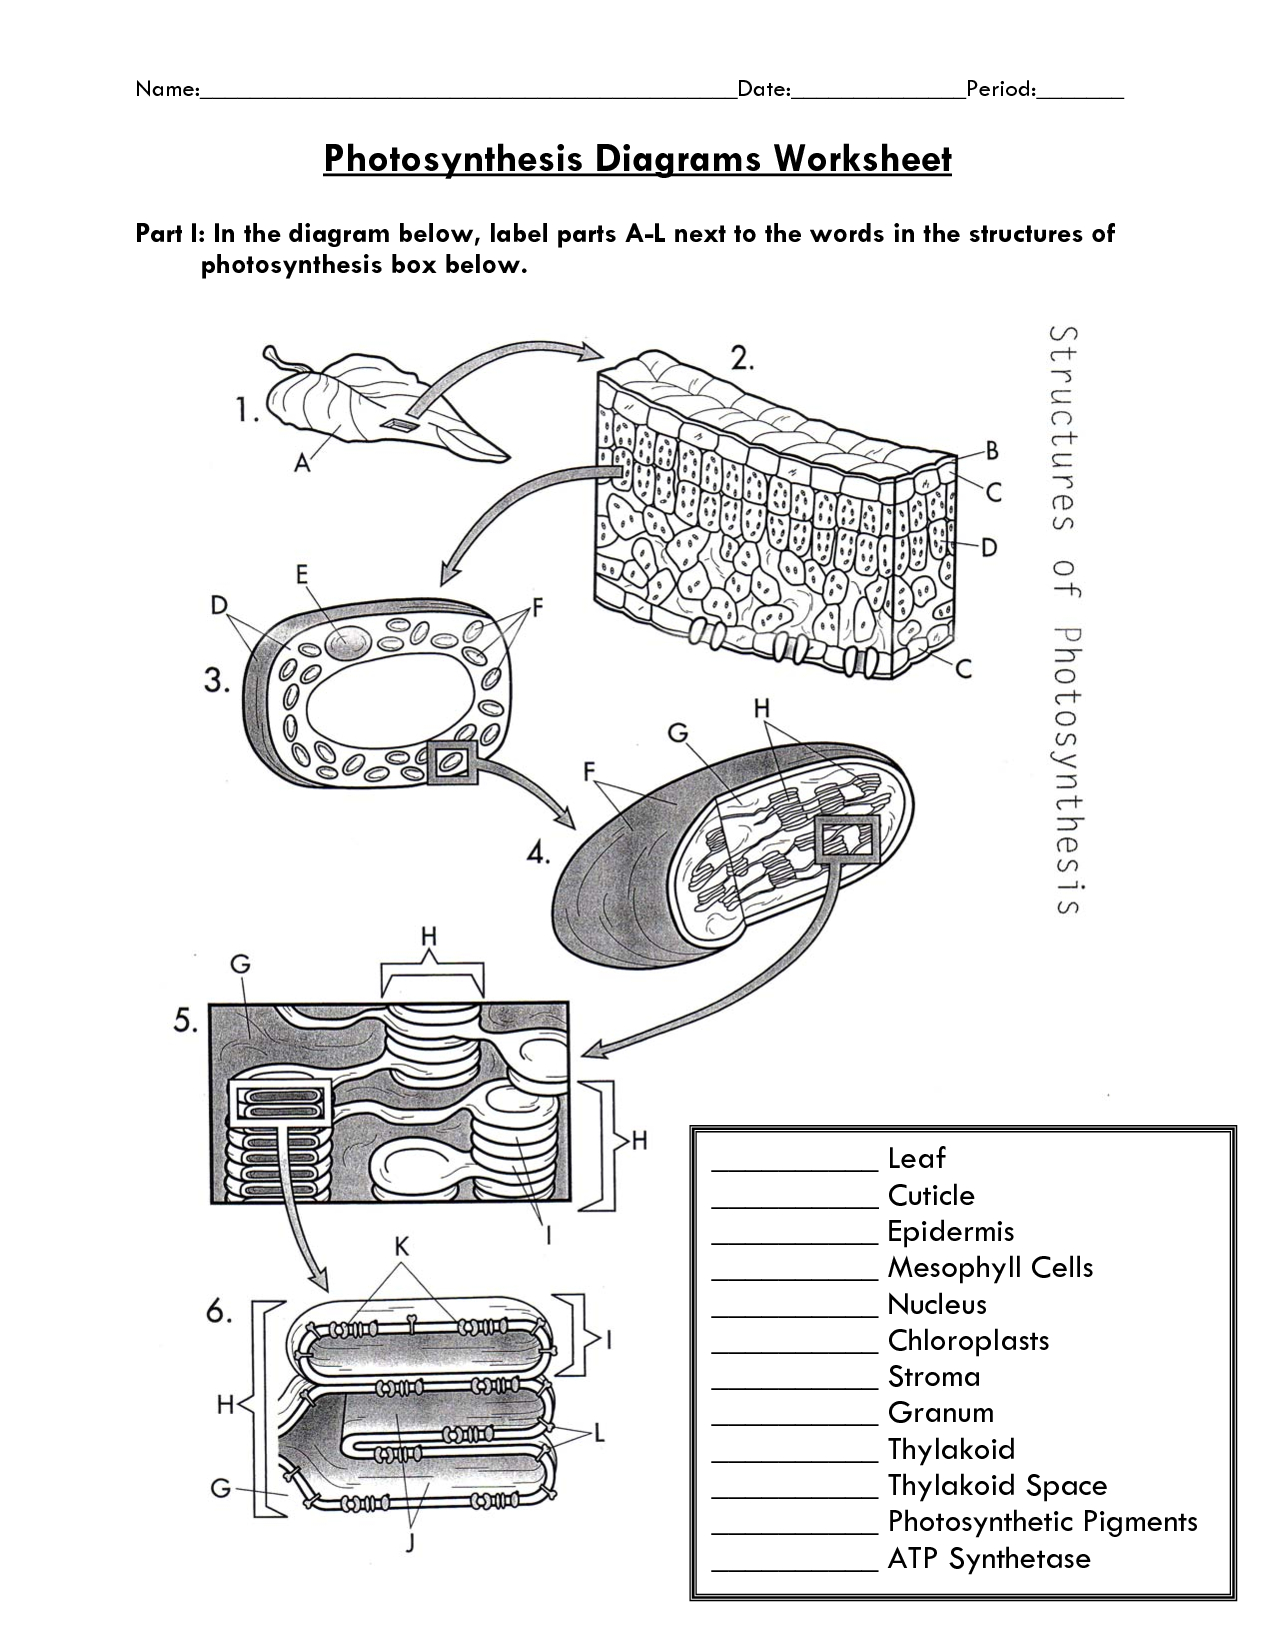 Photosynthesis Diagram Worksheet   Biology Photosynthesis   Free Printable Photosynthesis Worksheets